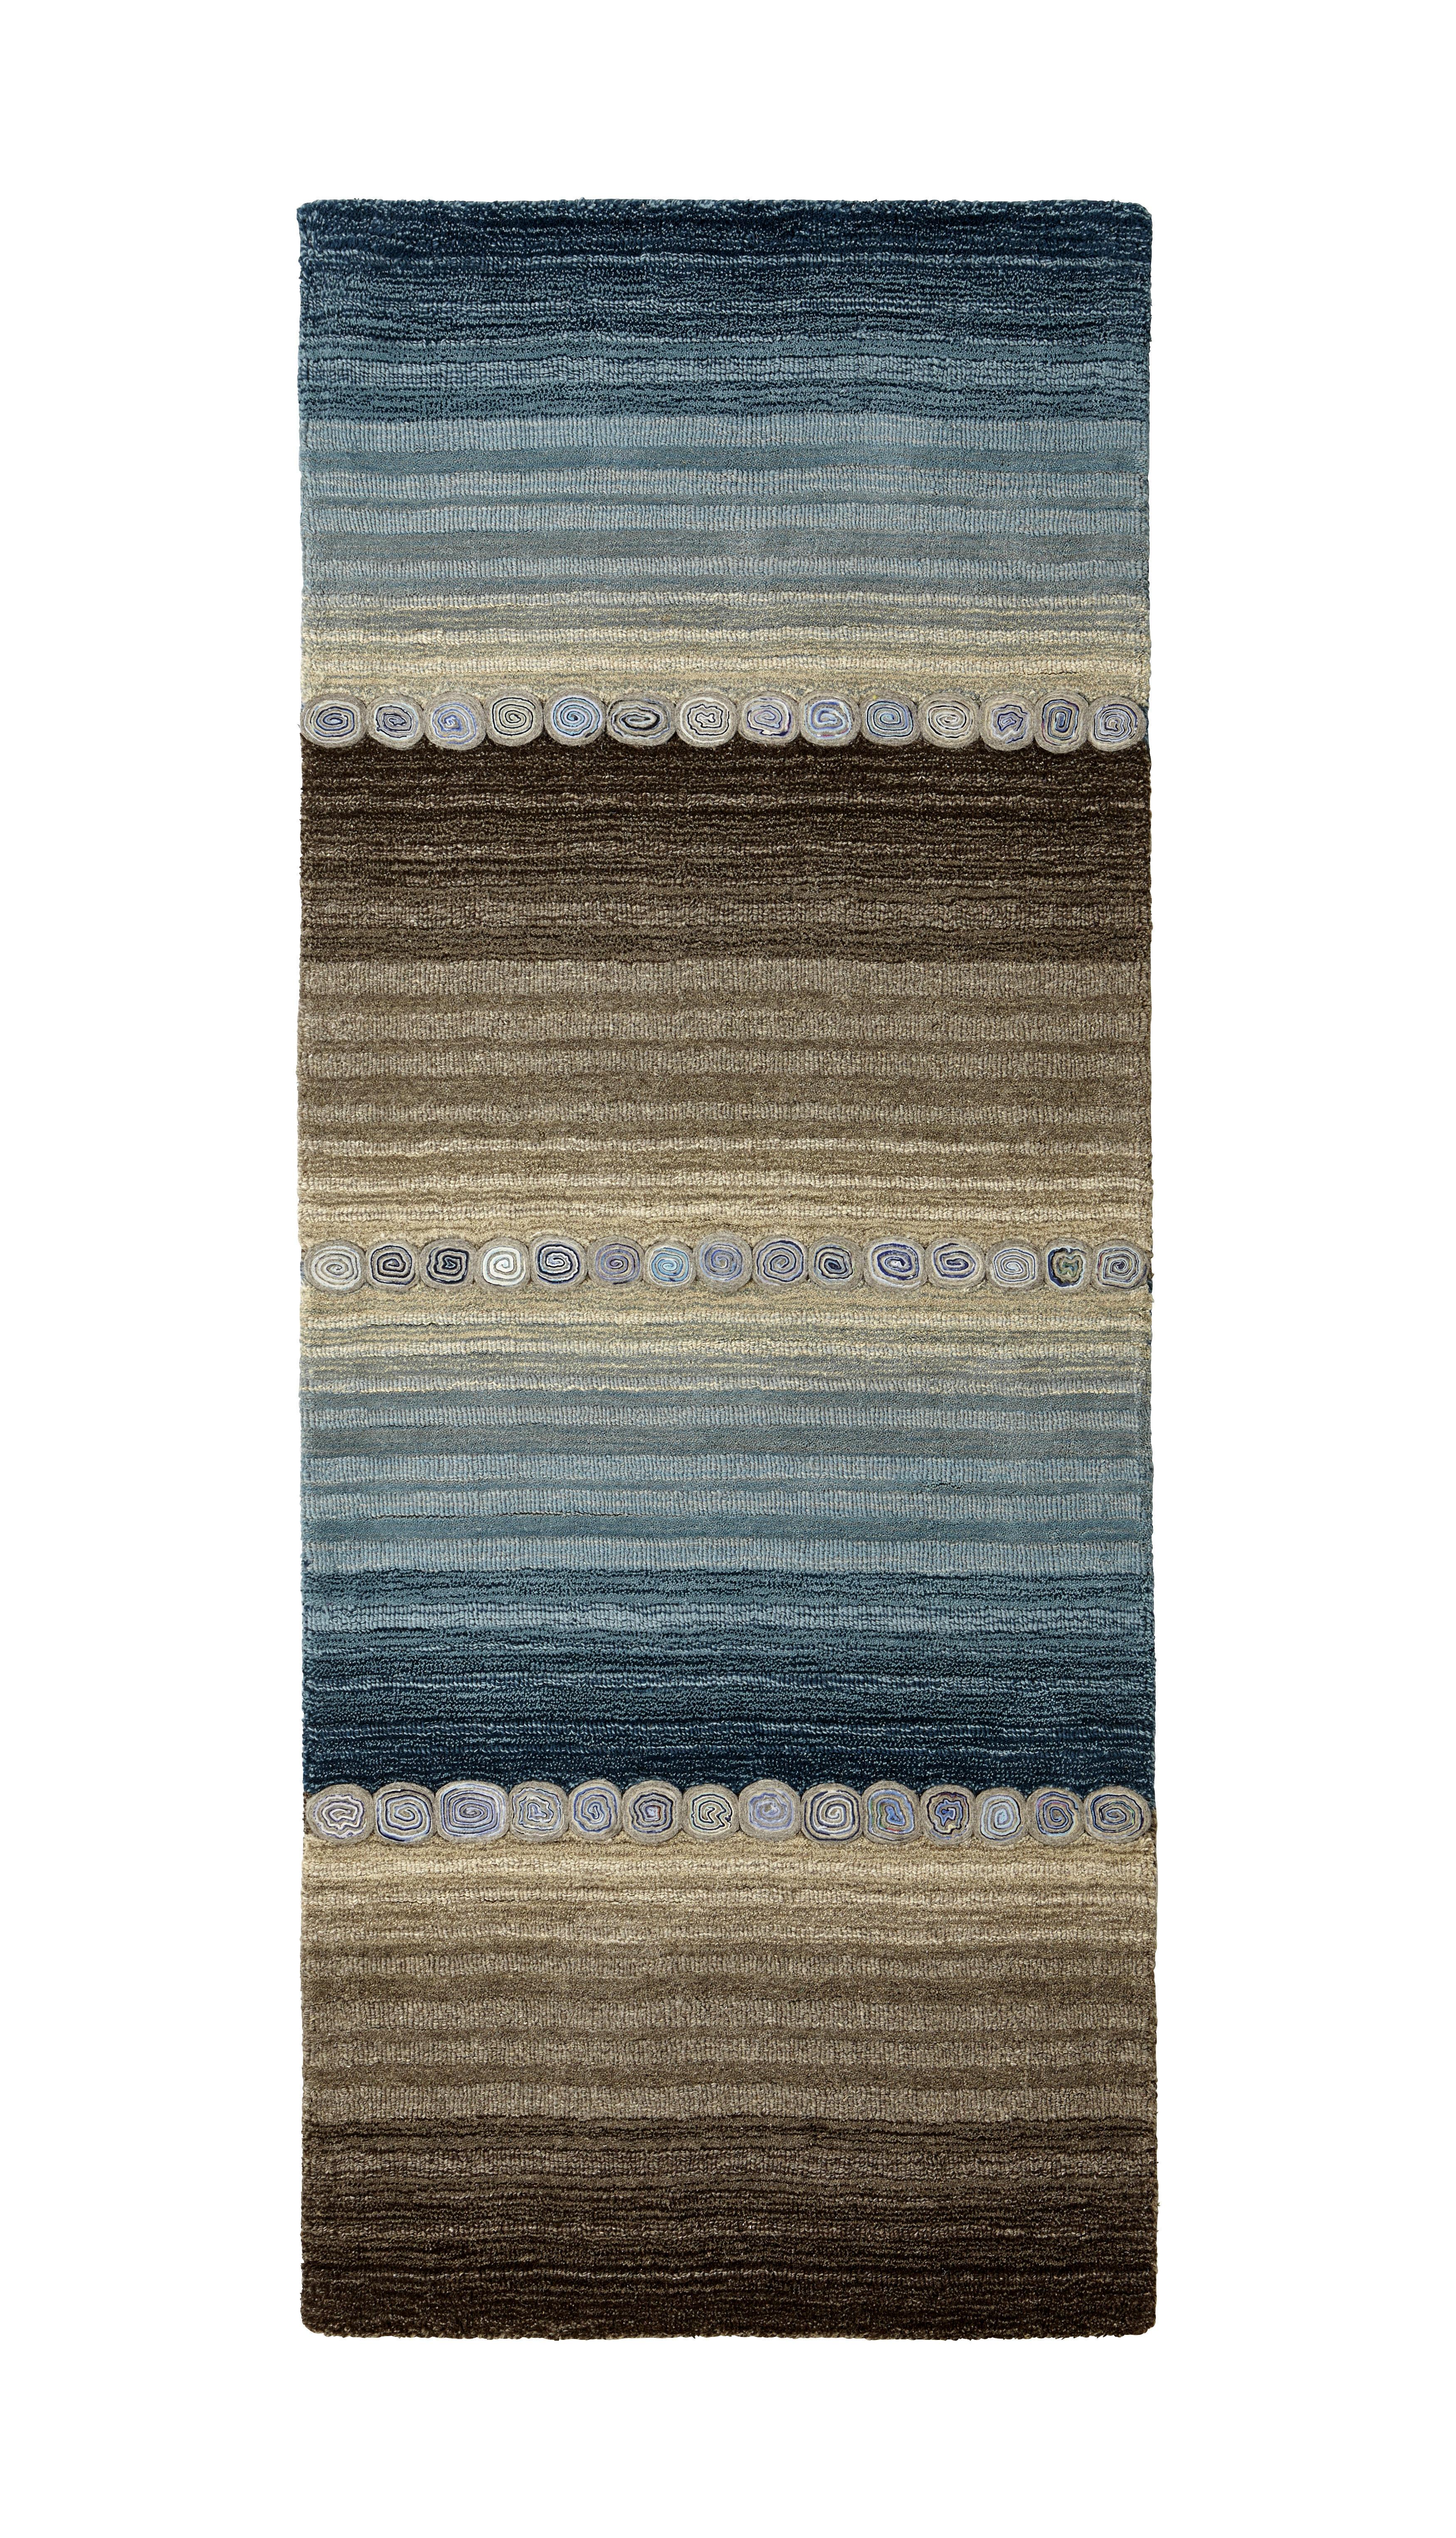 Levně Esposa ORIENTÁLNÍ KOBEREC, 80/300 cm, modrá, šedá - modrá, šedá